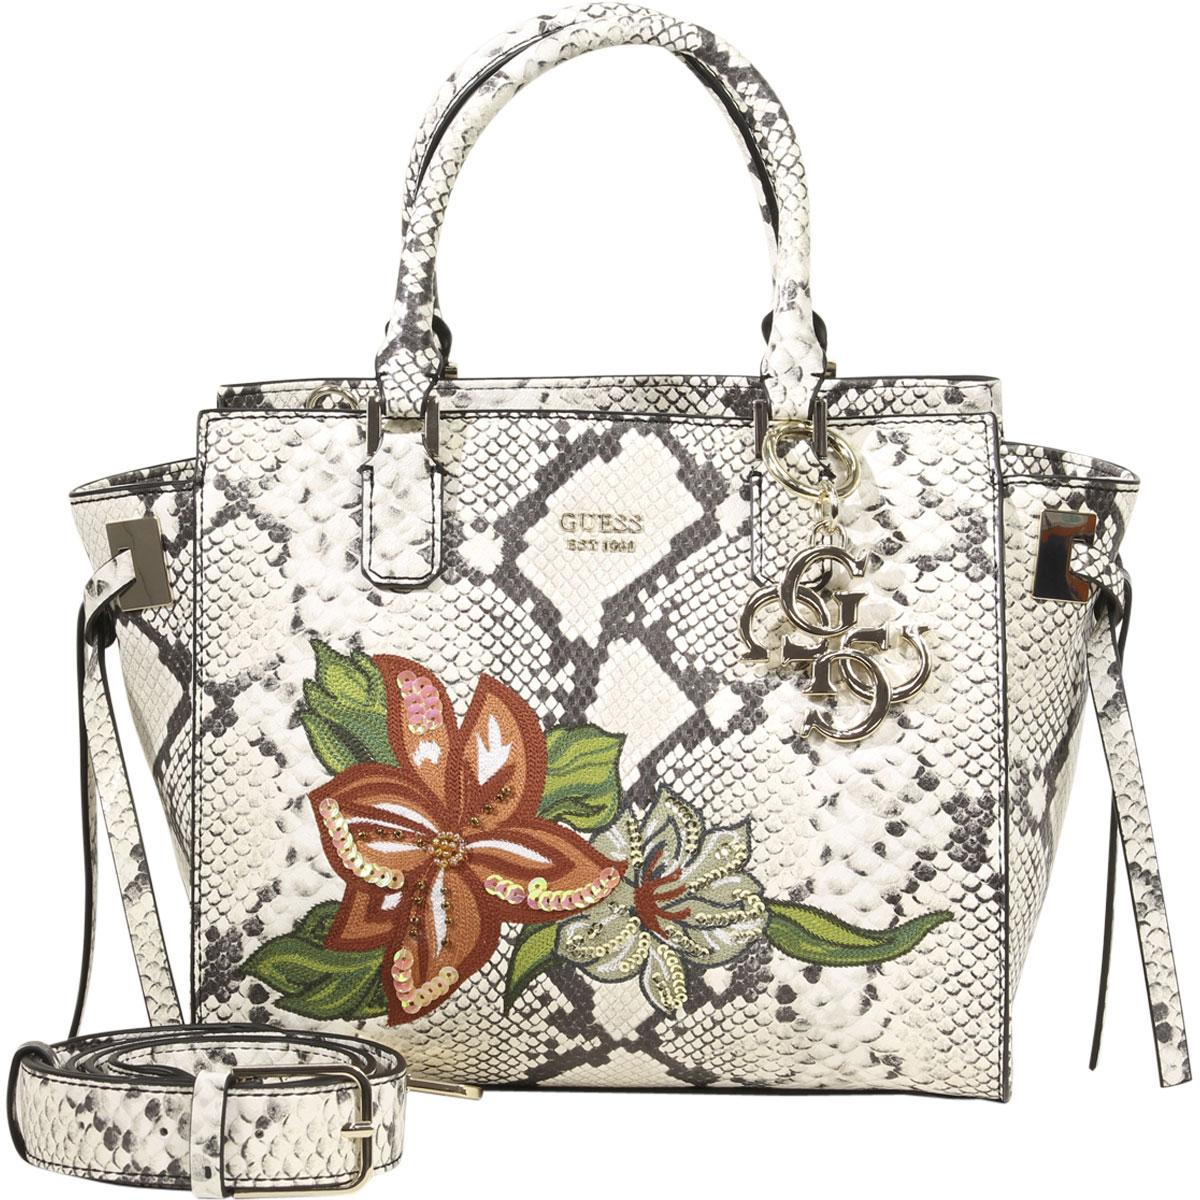 Guess Women s Digital Status Satchel Handbag by Guess 2d964cf2e1